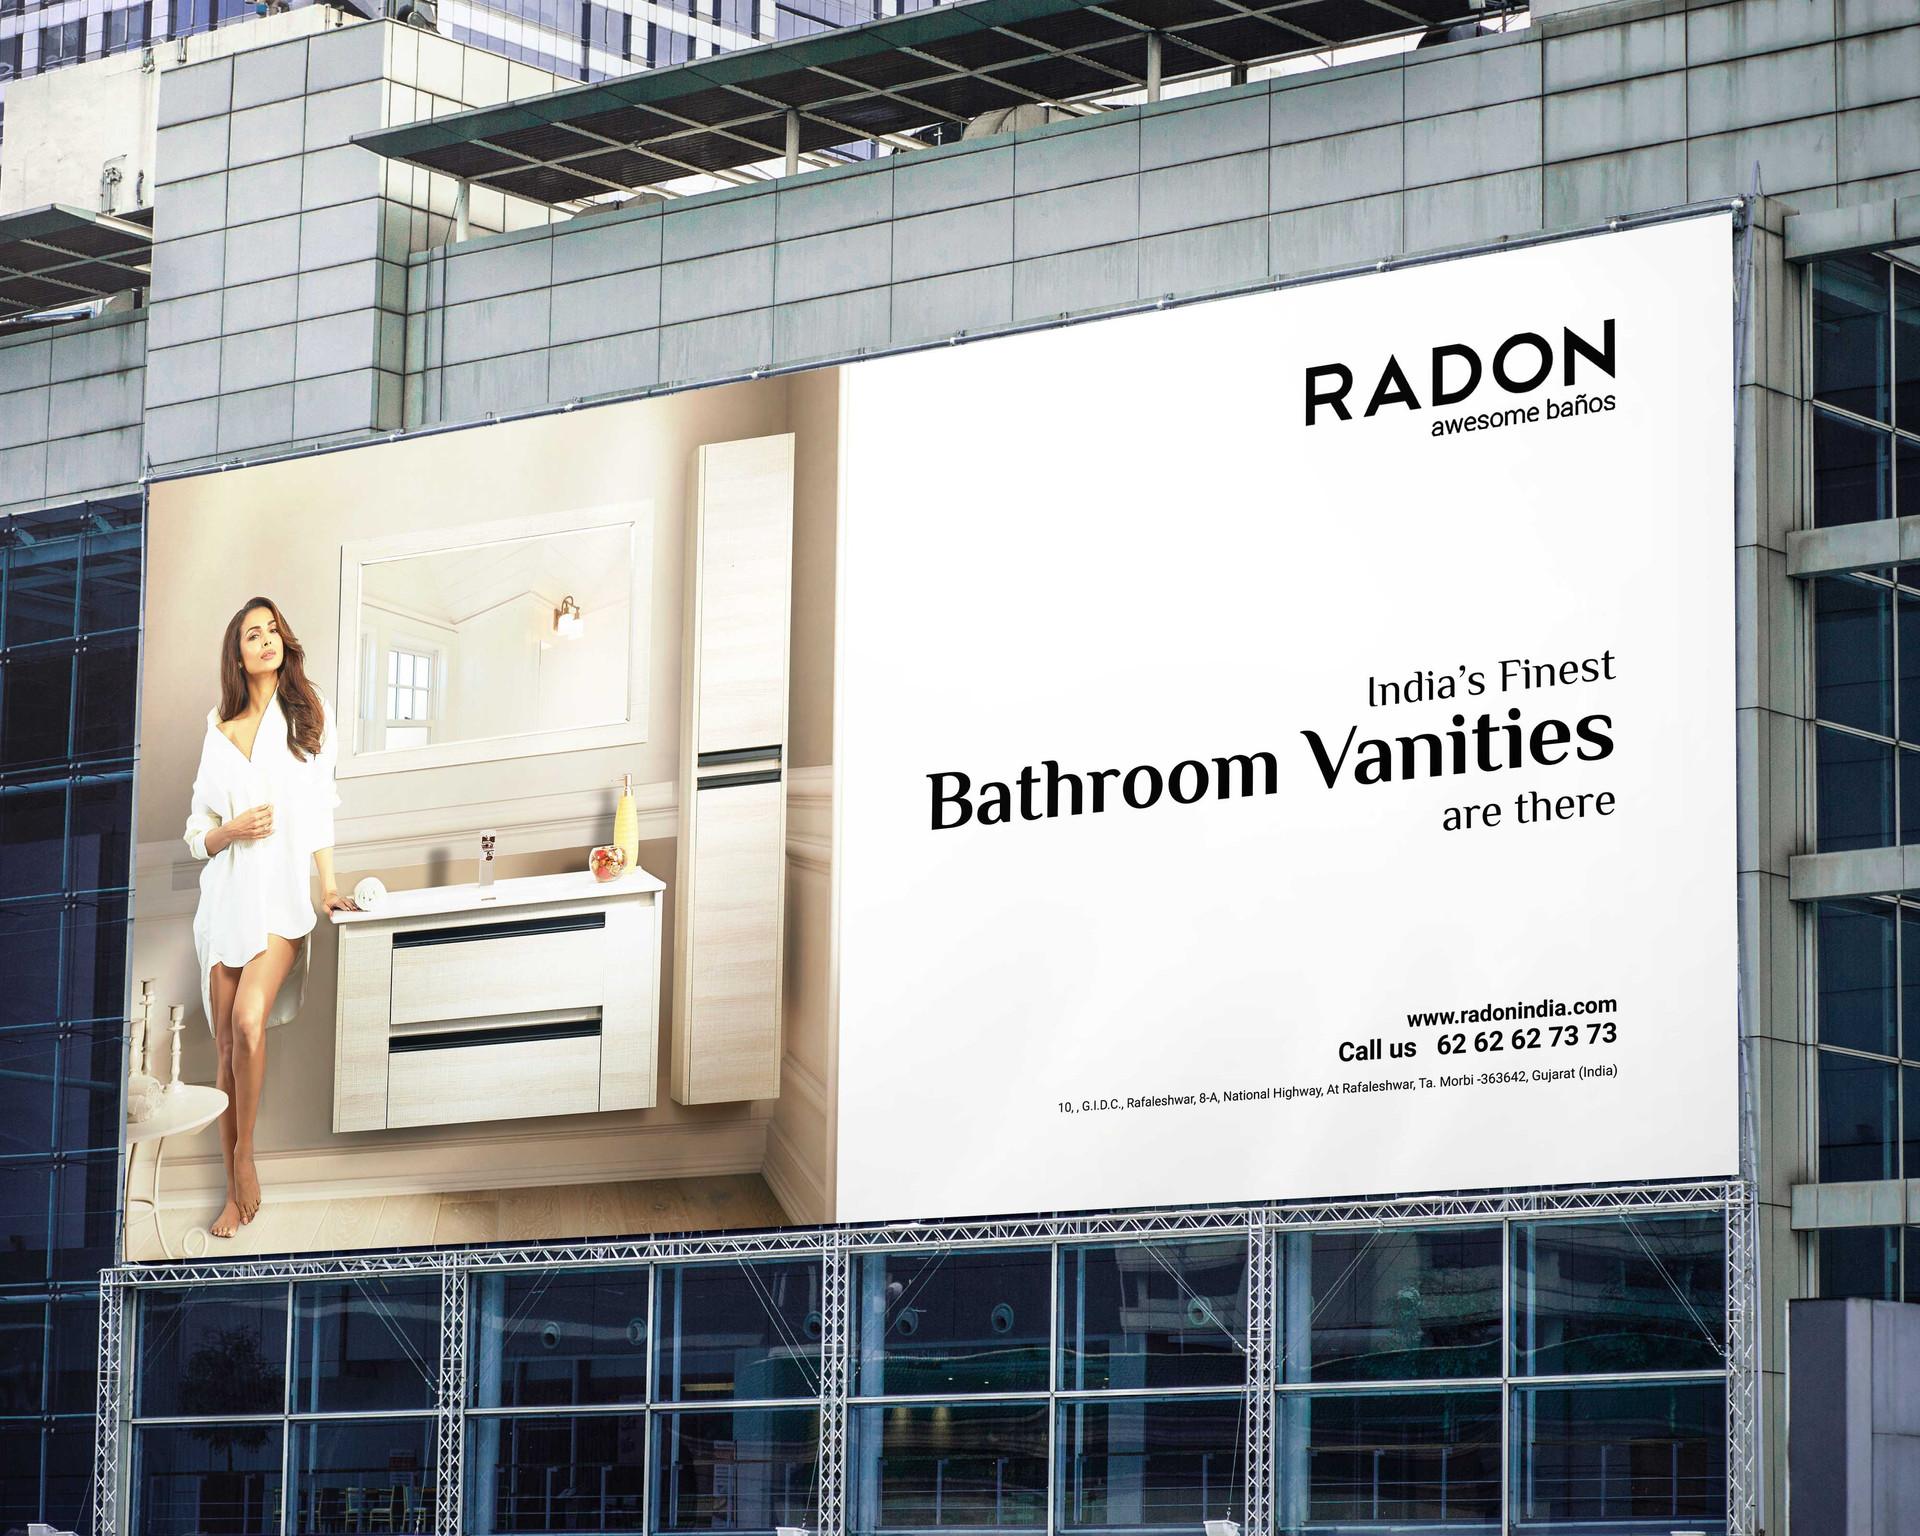 radon billboard low.jpg